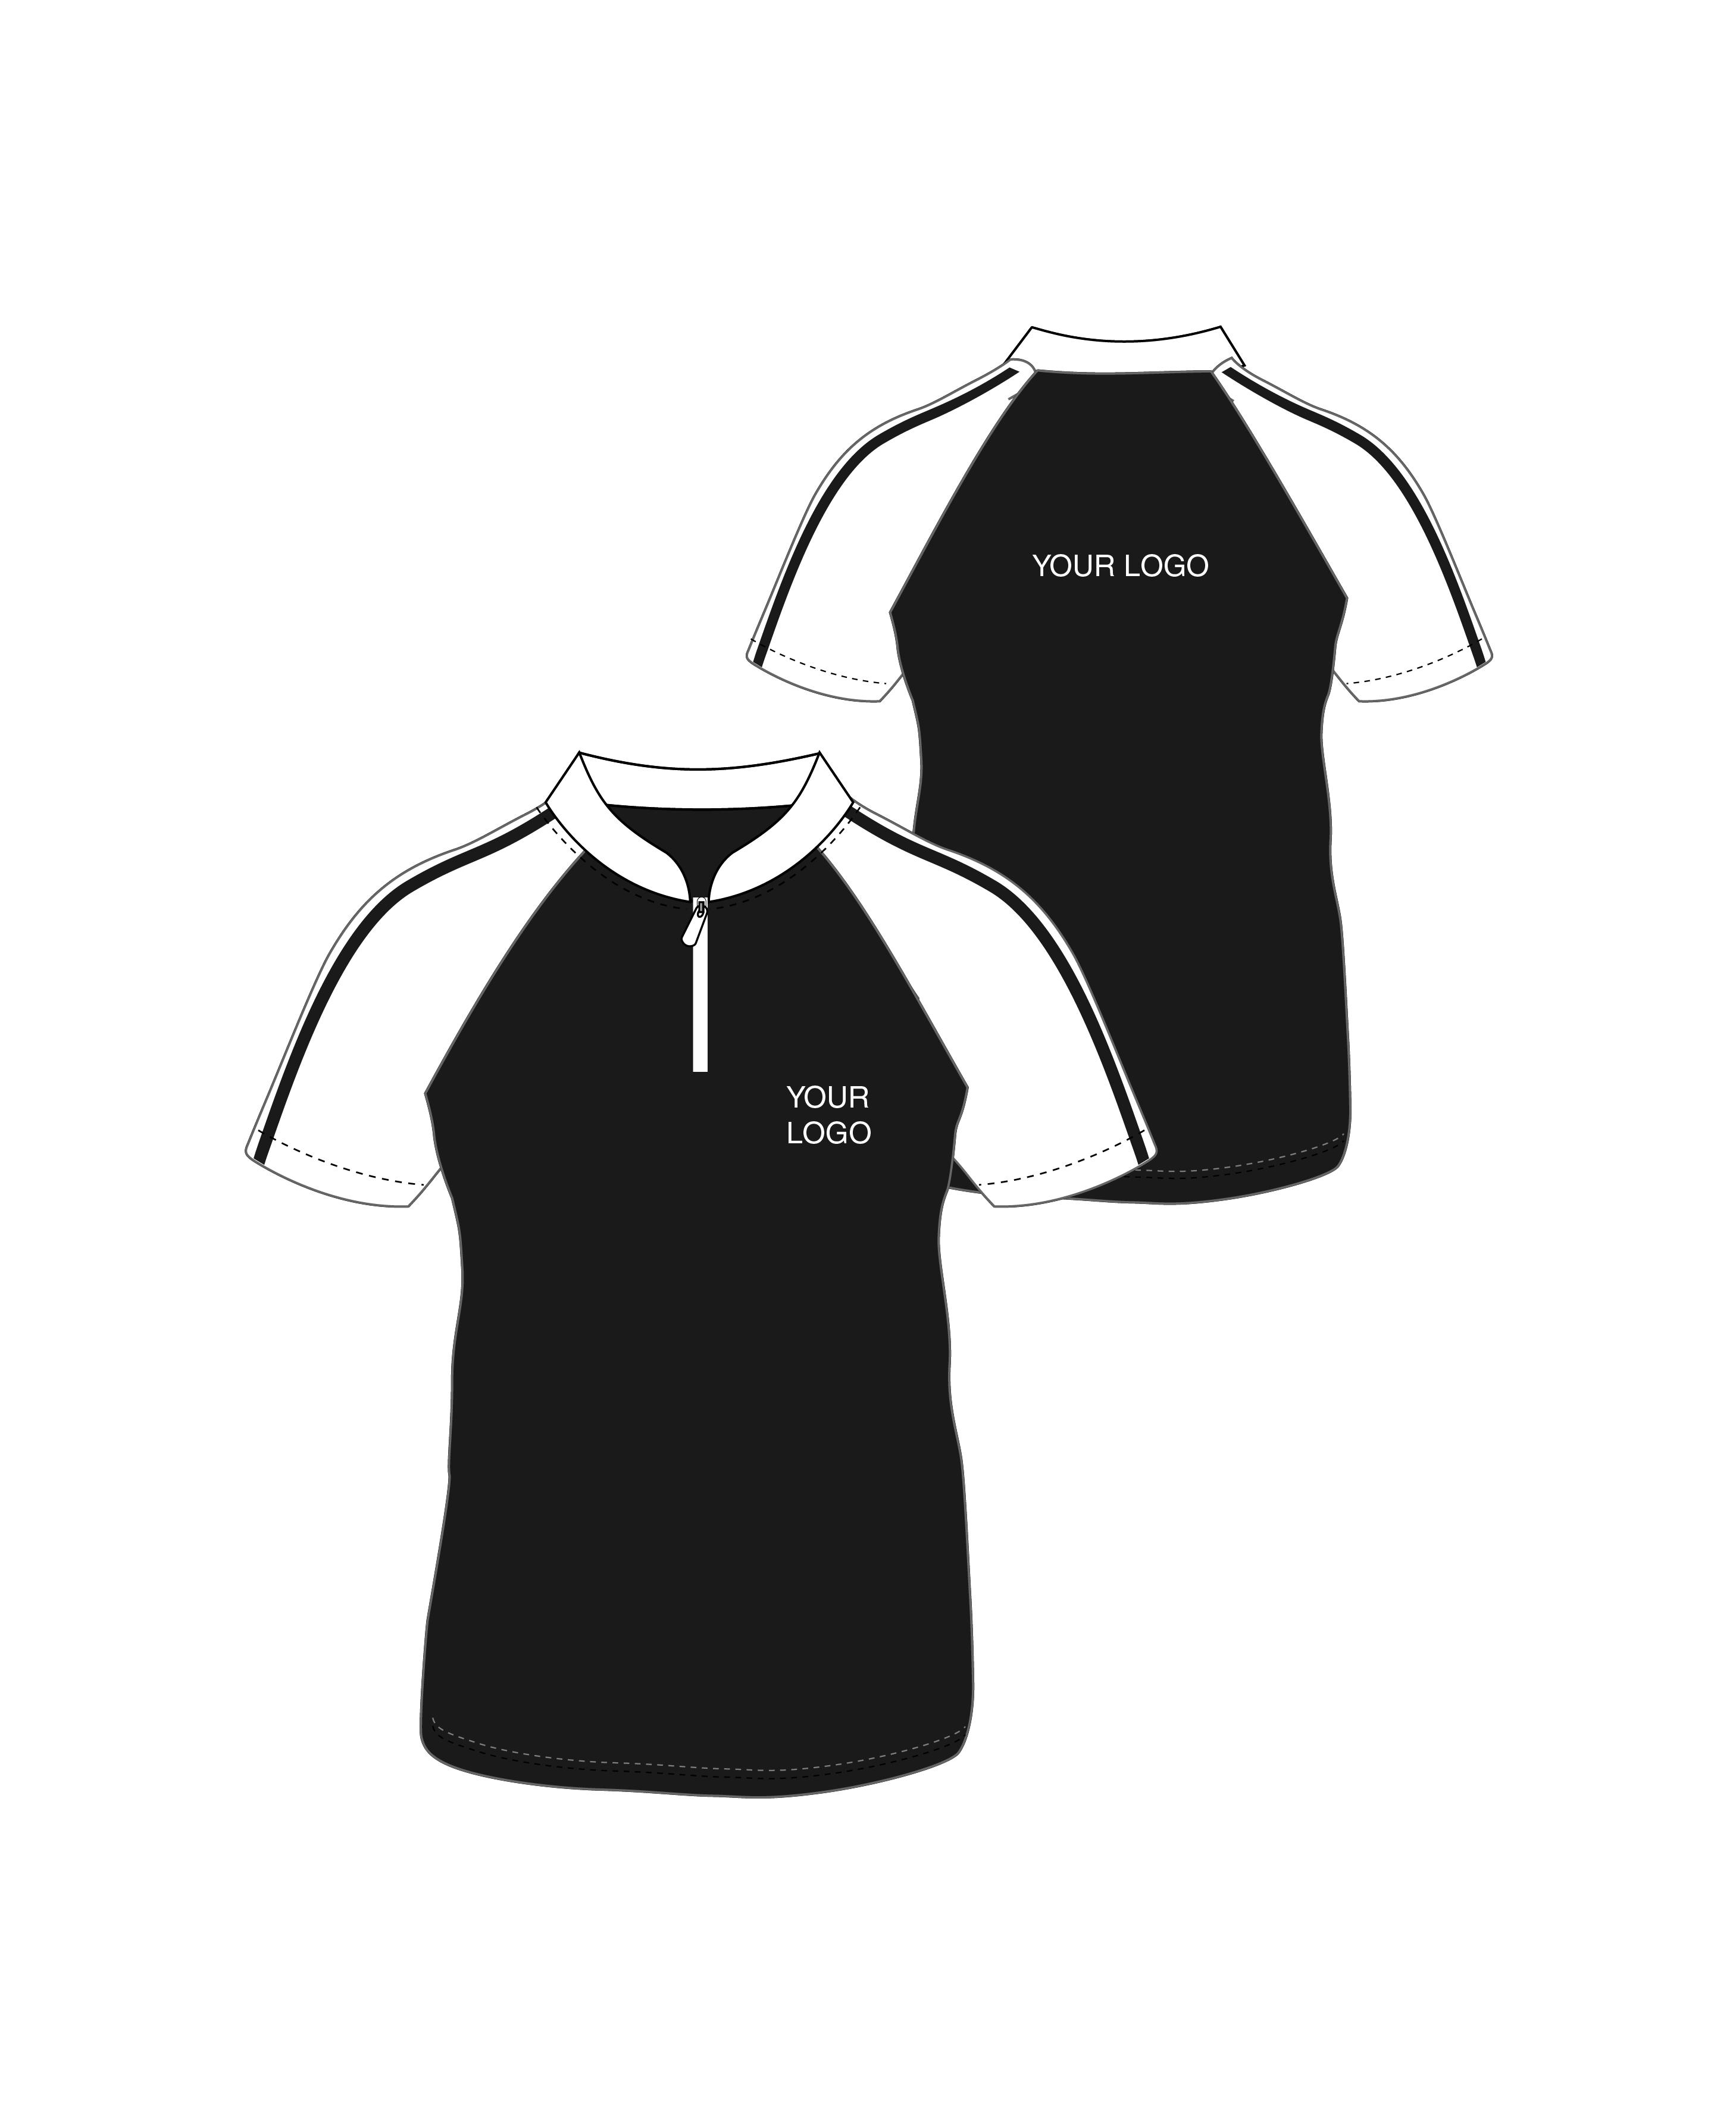 Polo T Shirt Tee Customize Company Logo Apparel Long Short Sleeve